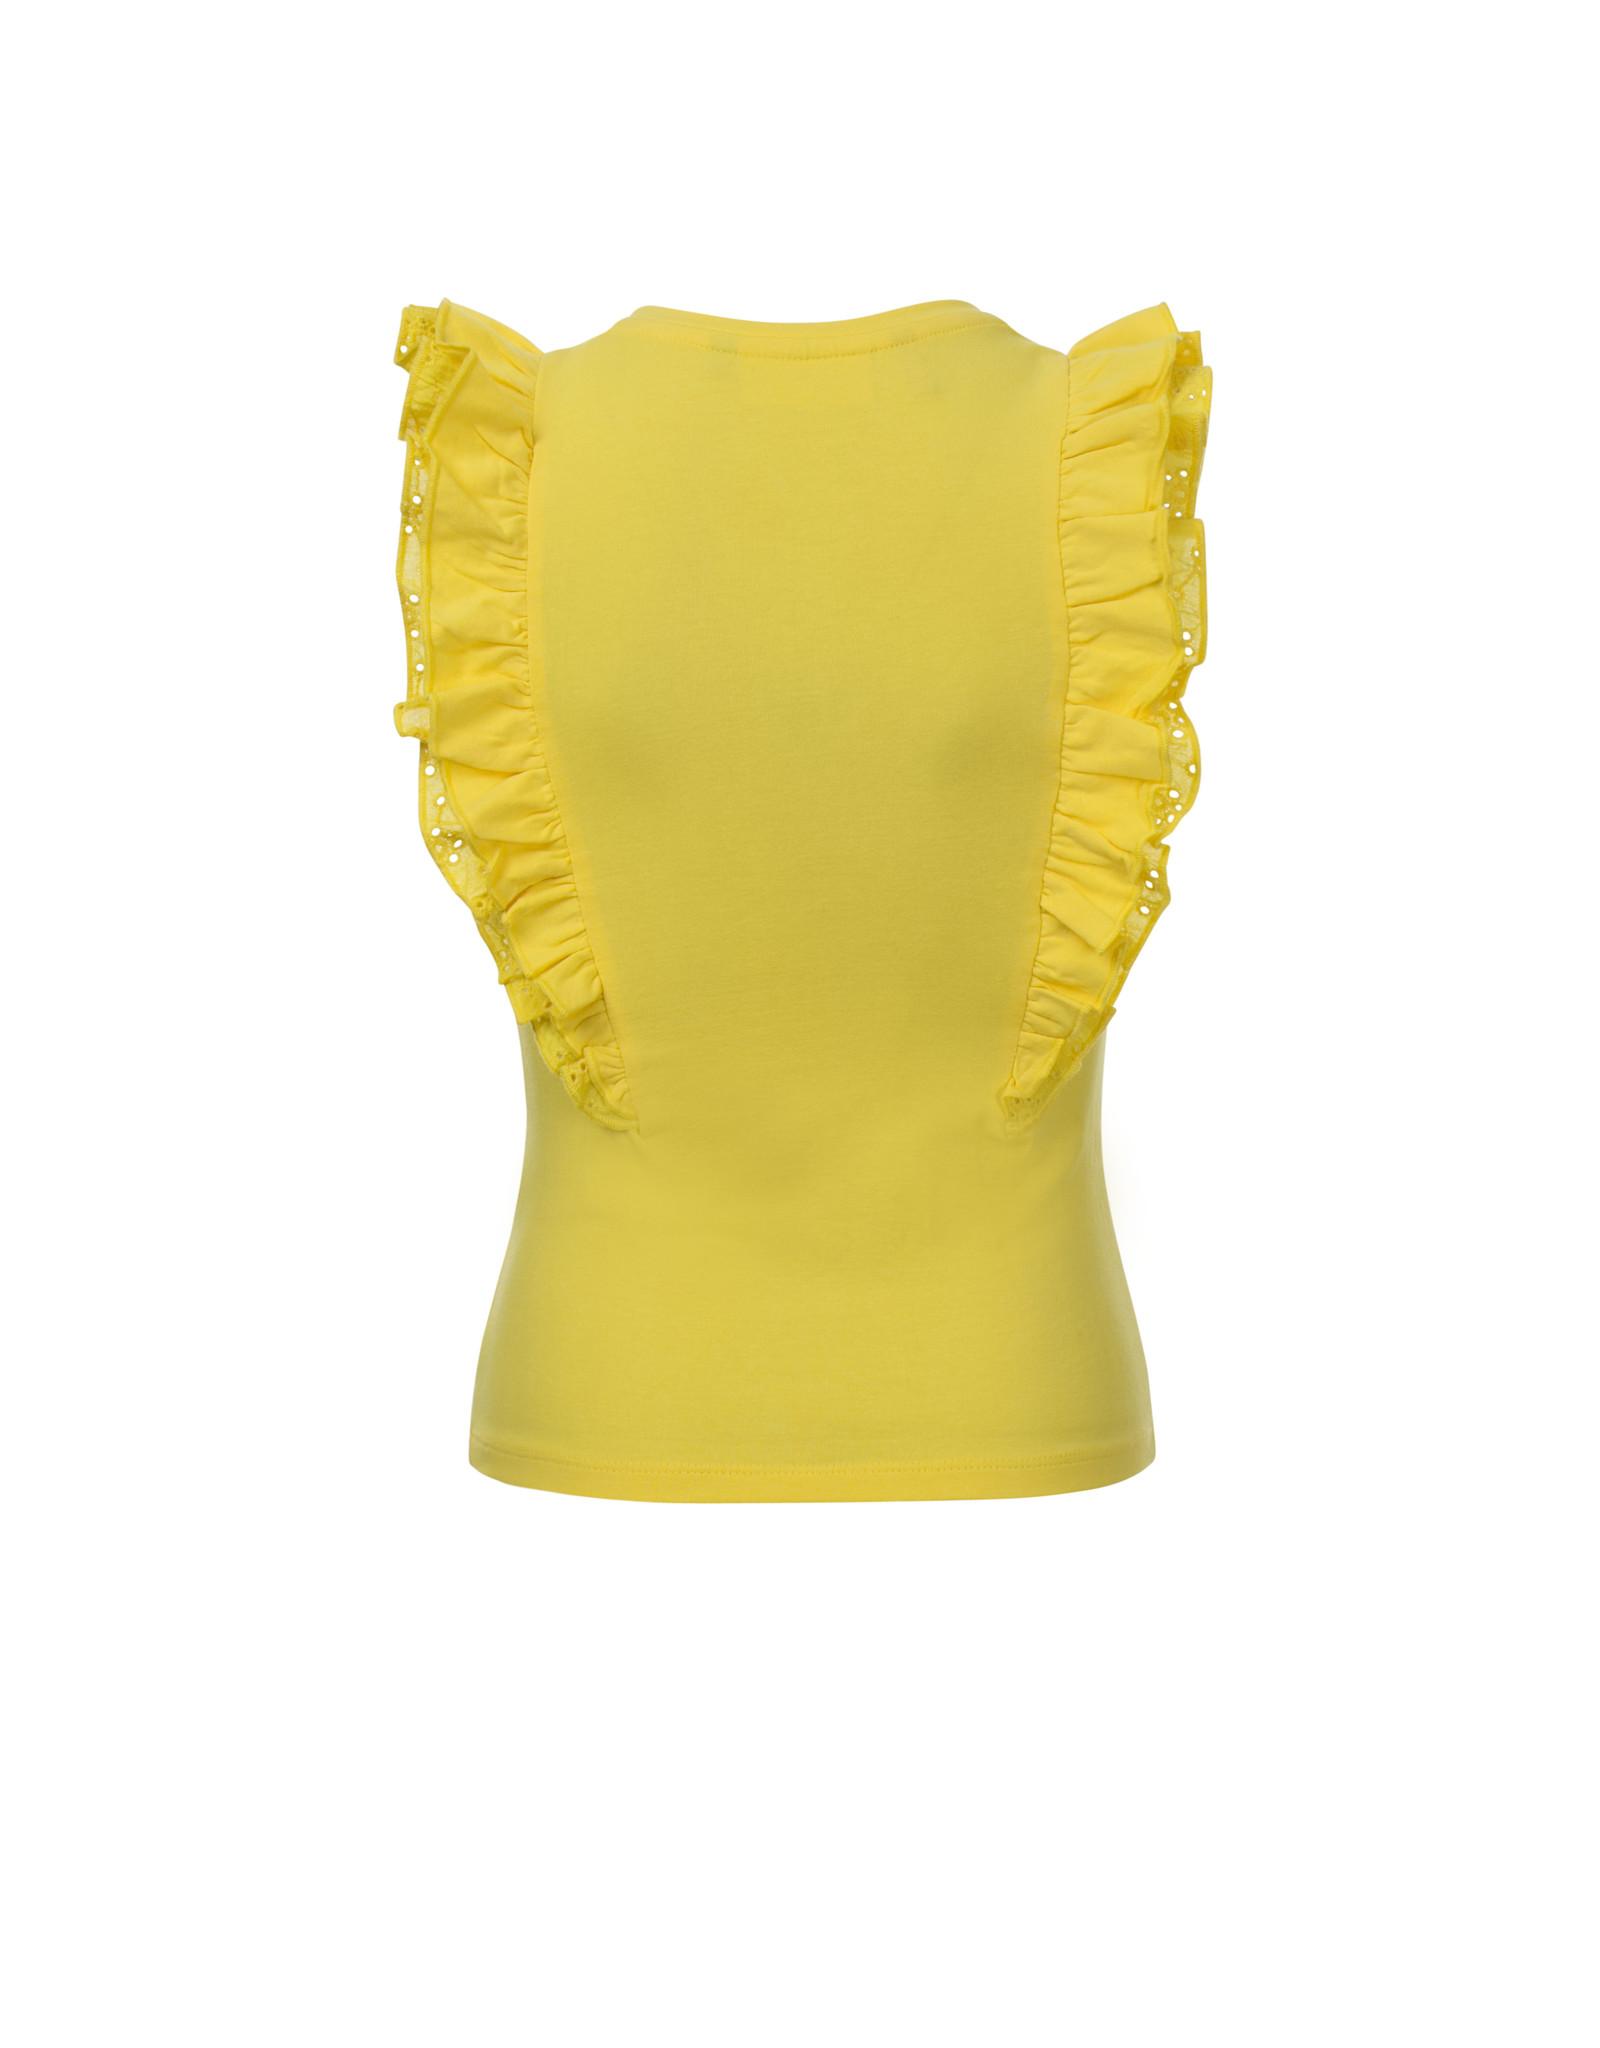 Looxs Revolution Girls T-shirt sleeveless